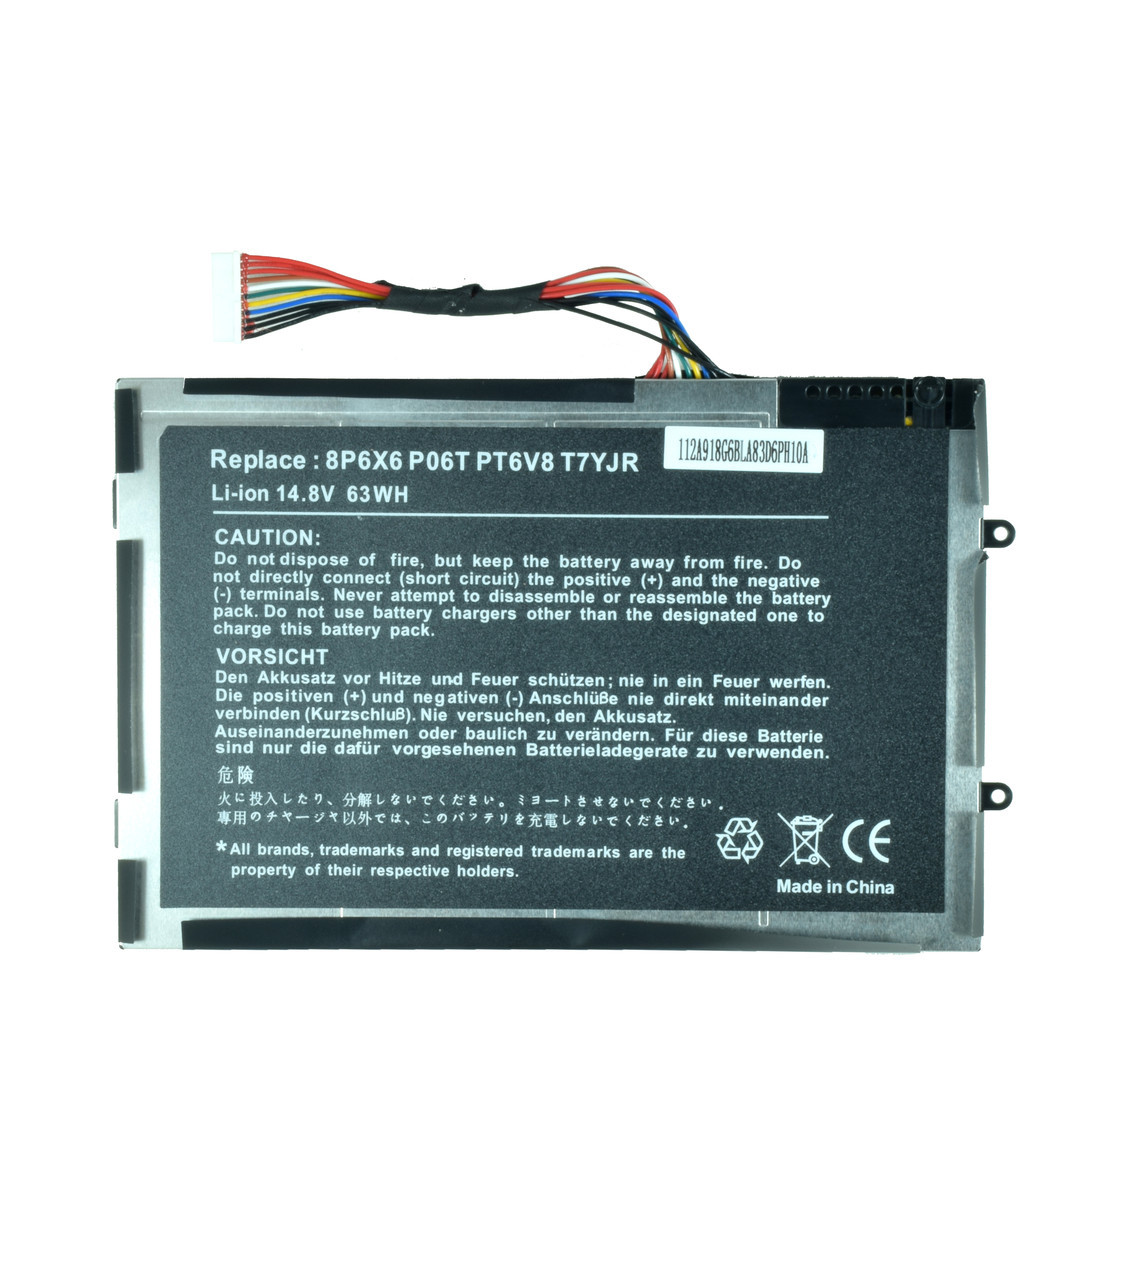 Батарея для ноутбука DELL PT6V8 P06T P18G 8P6X6 08P6X6 KR-08P6X6 T7YJR